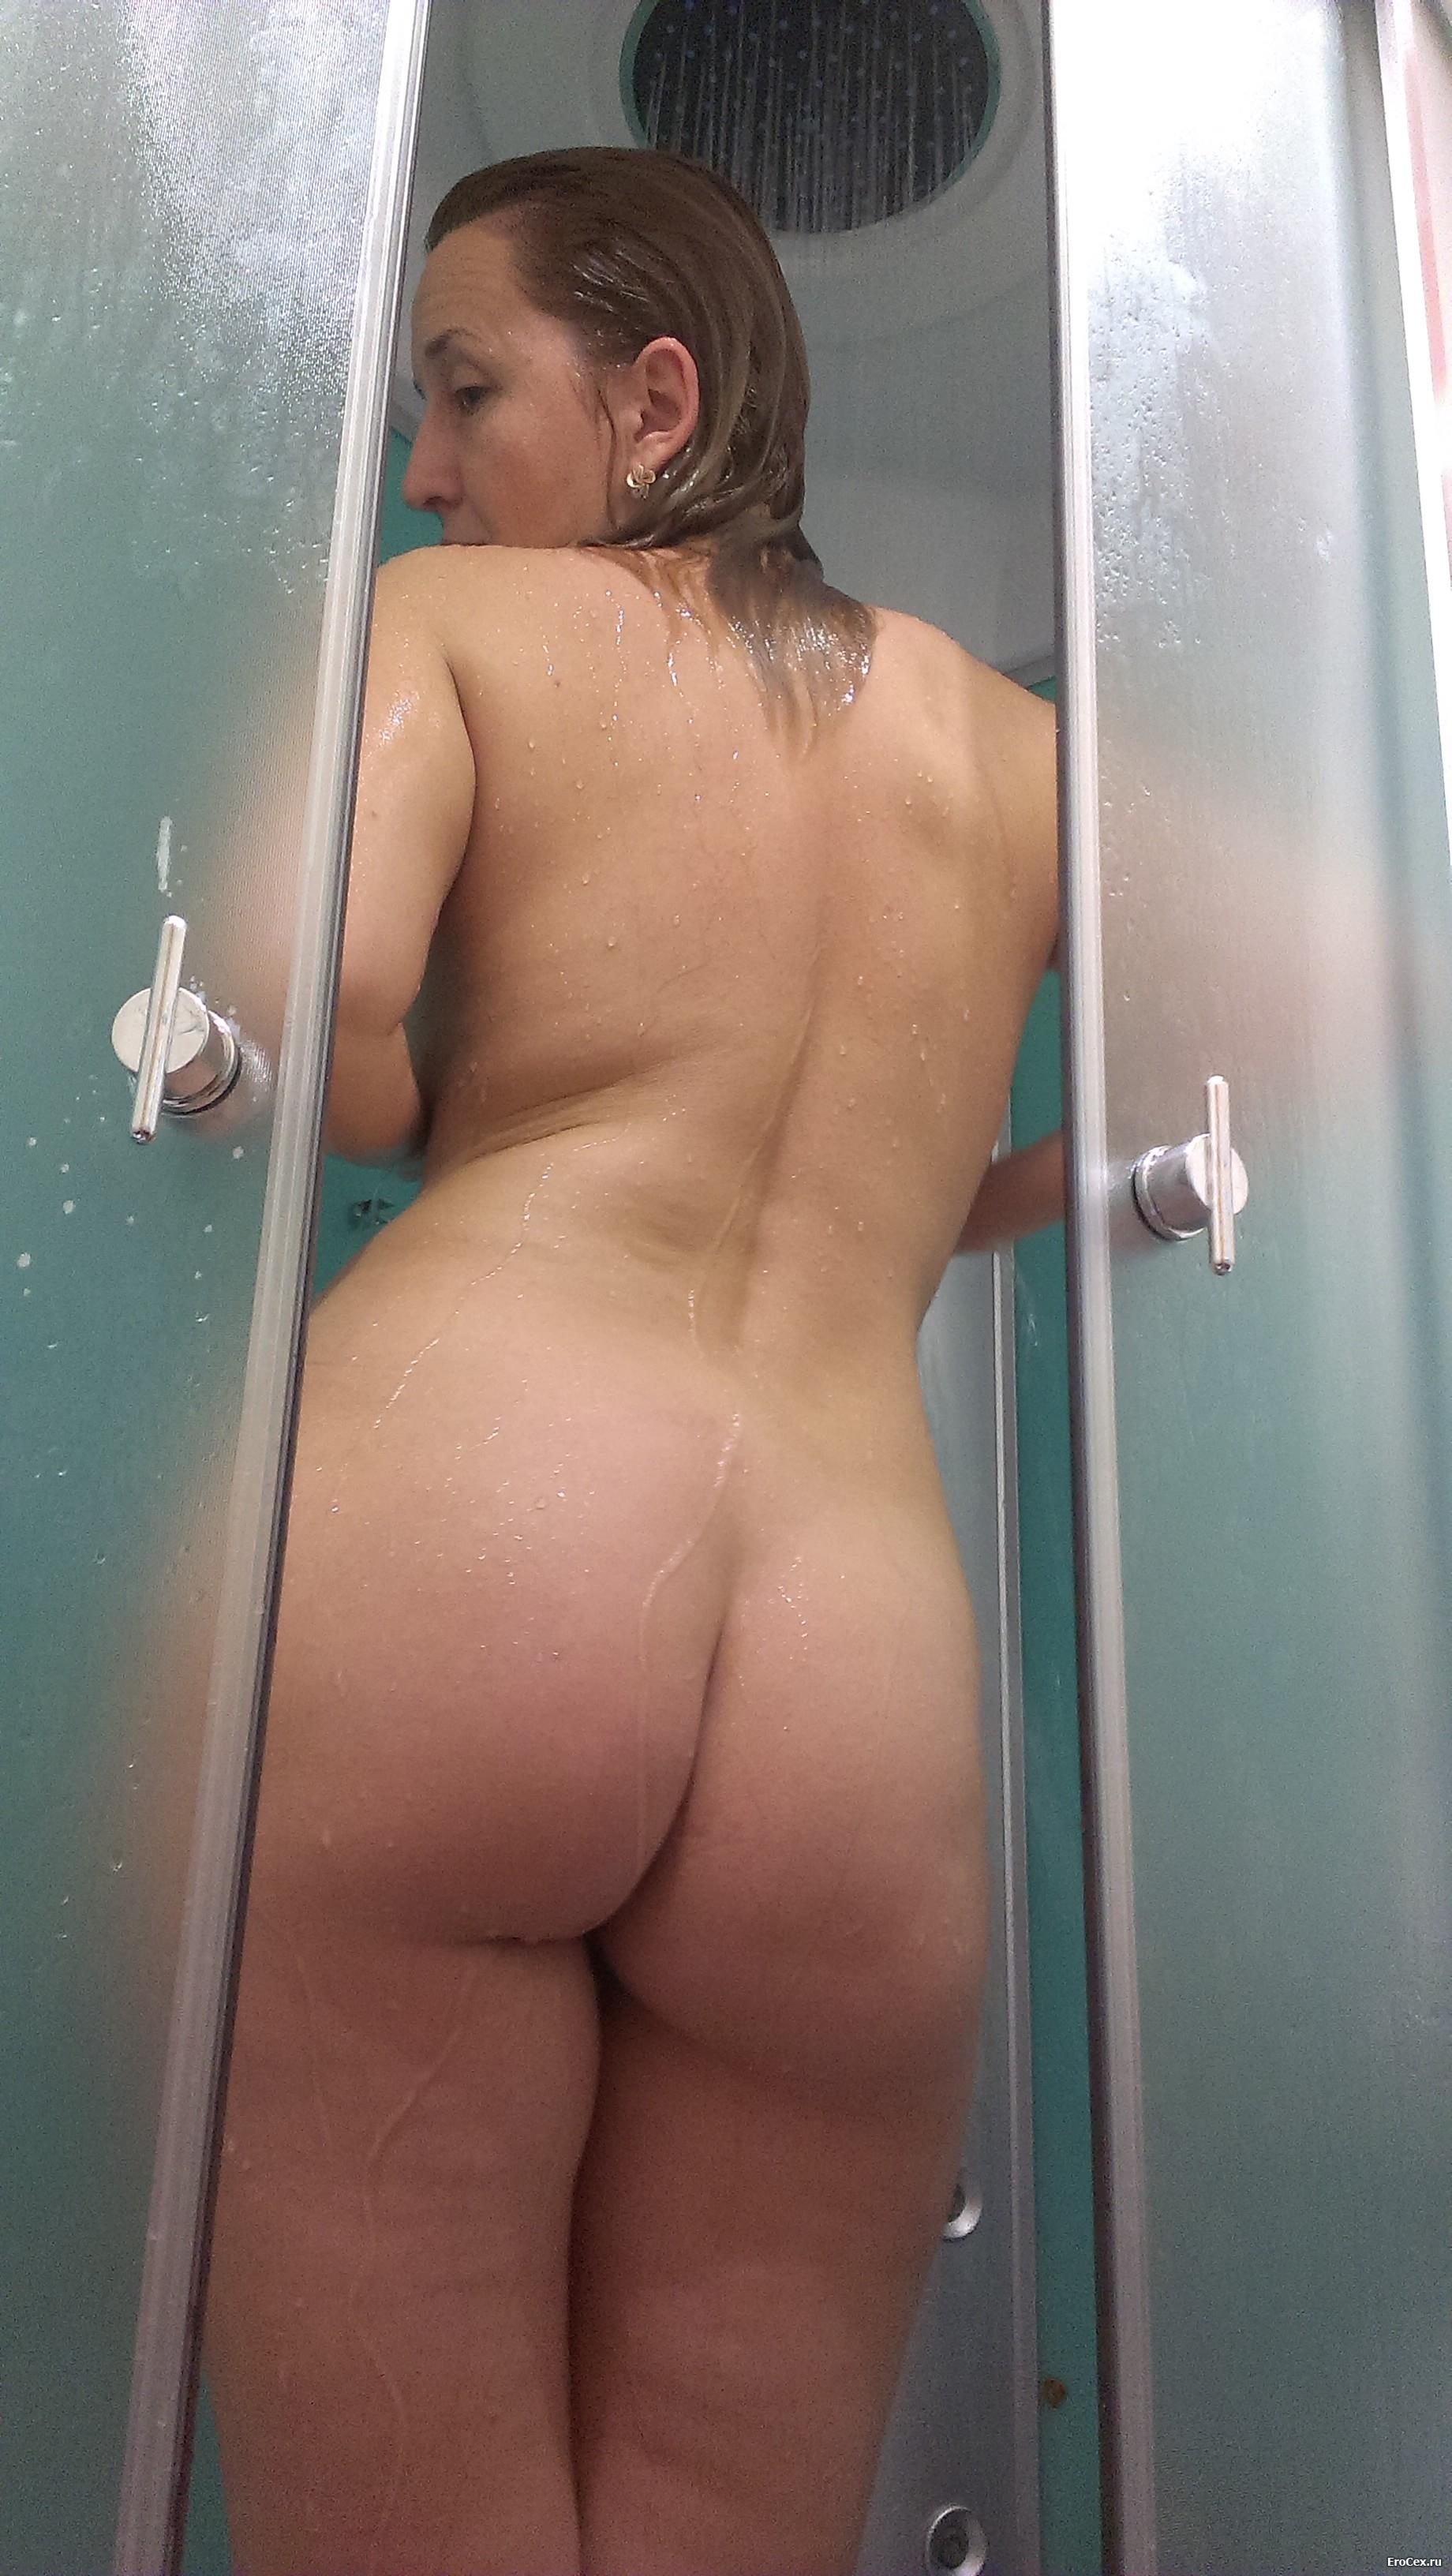 Voyeur Free Porn Pics